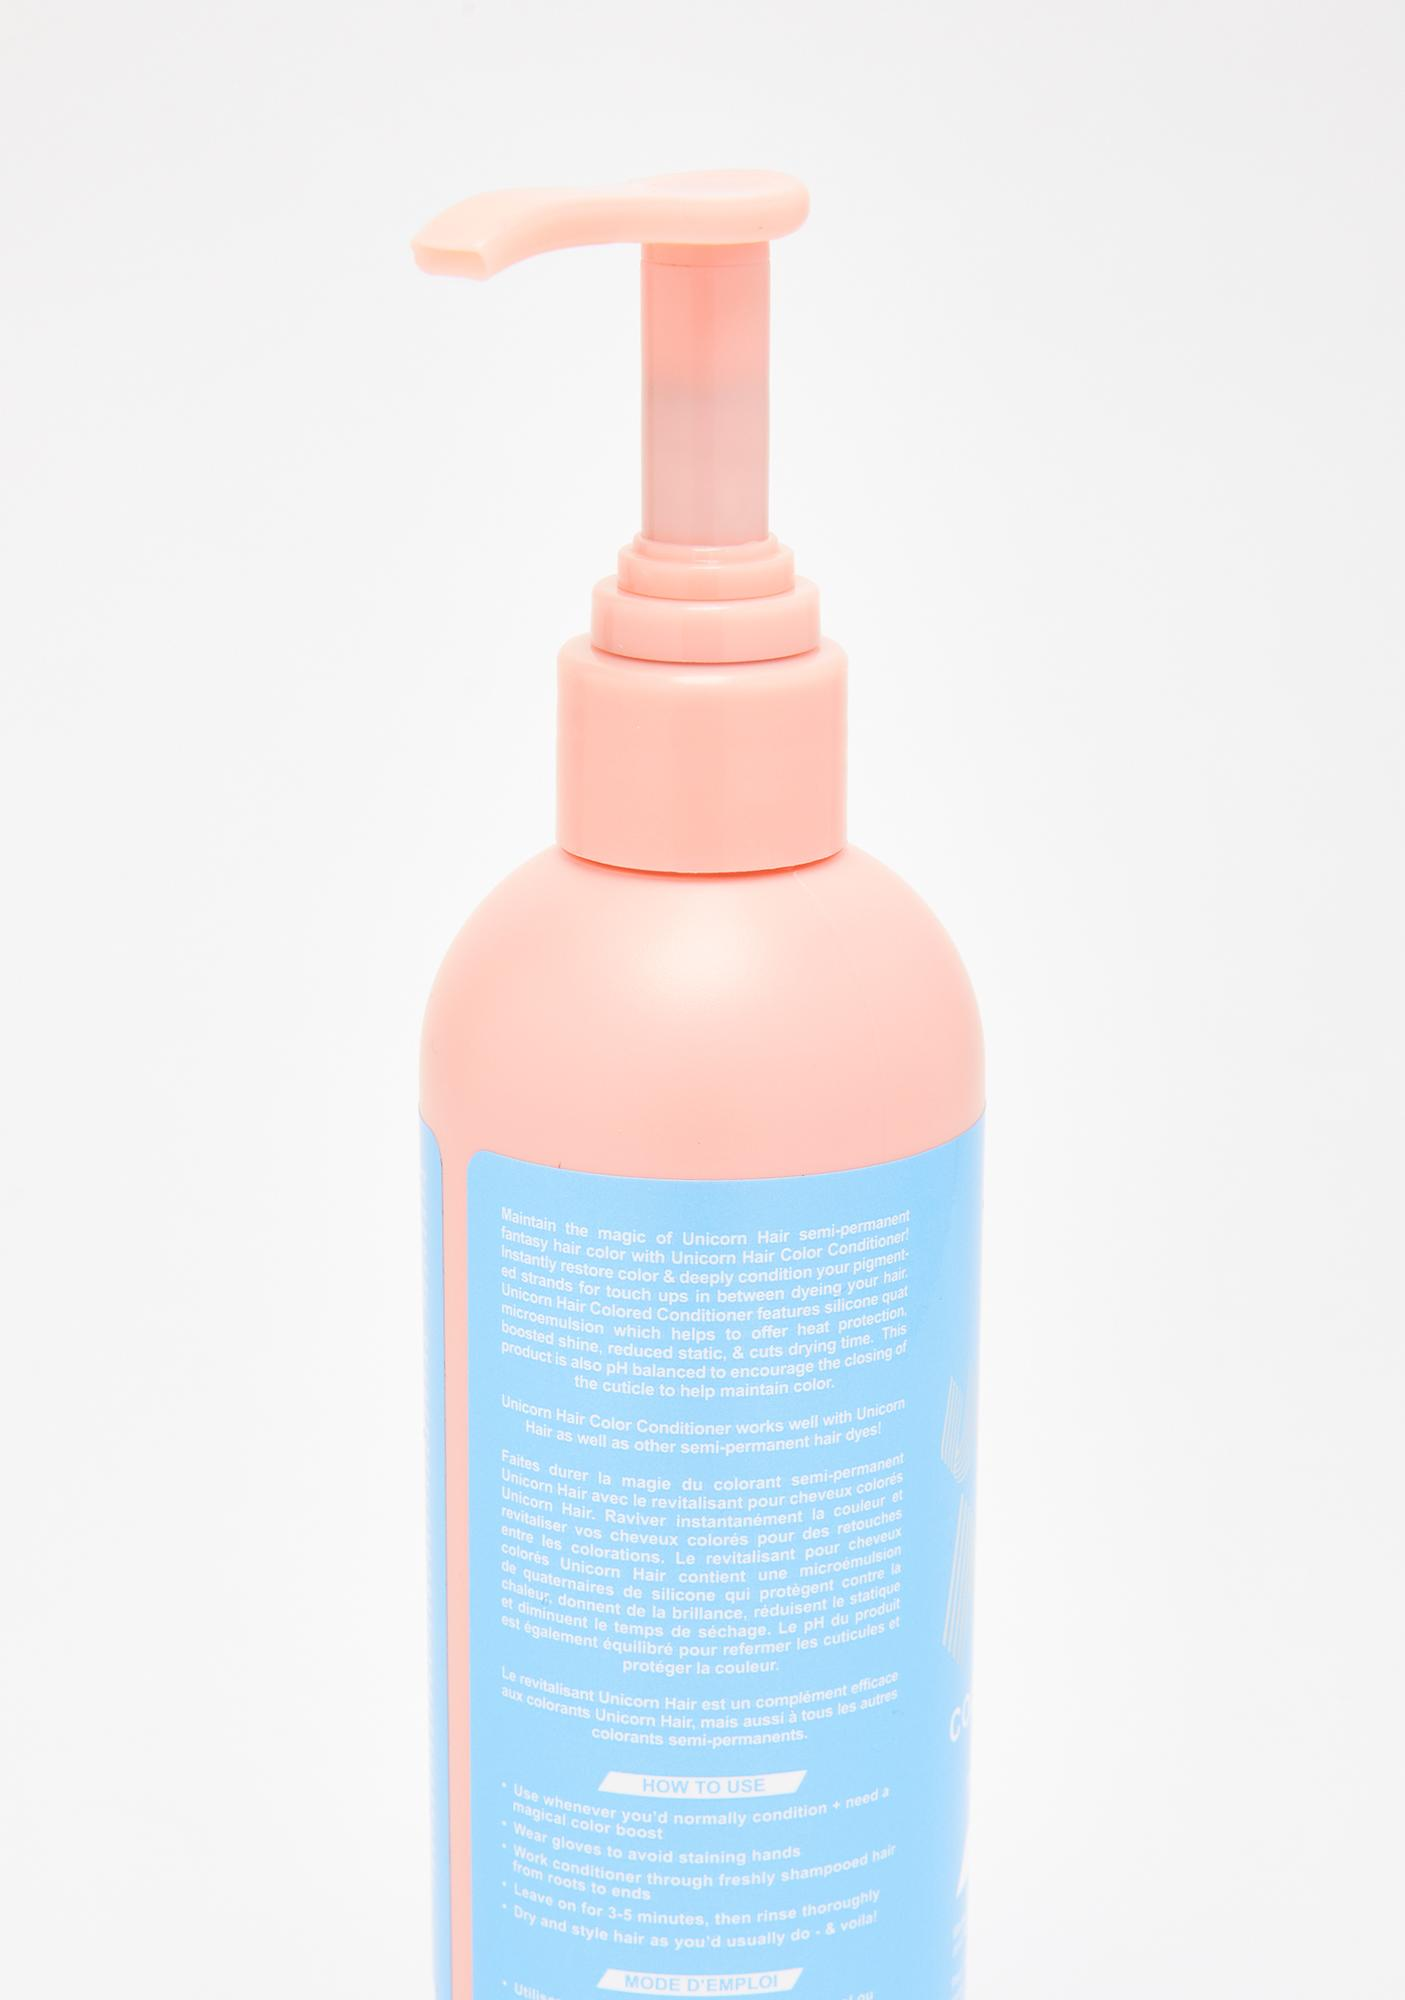 Lime Crime Aqua Unicorn Hair Color Conditioner